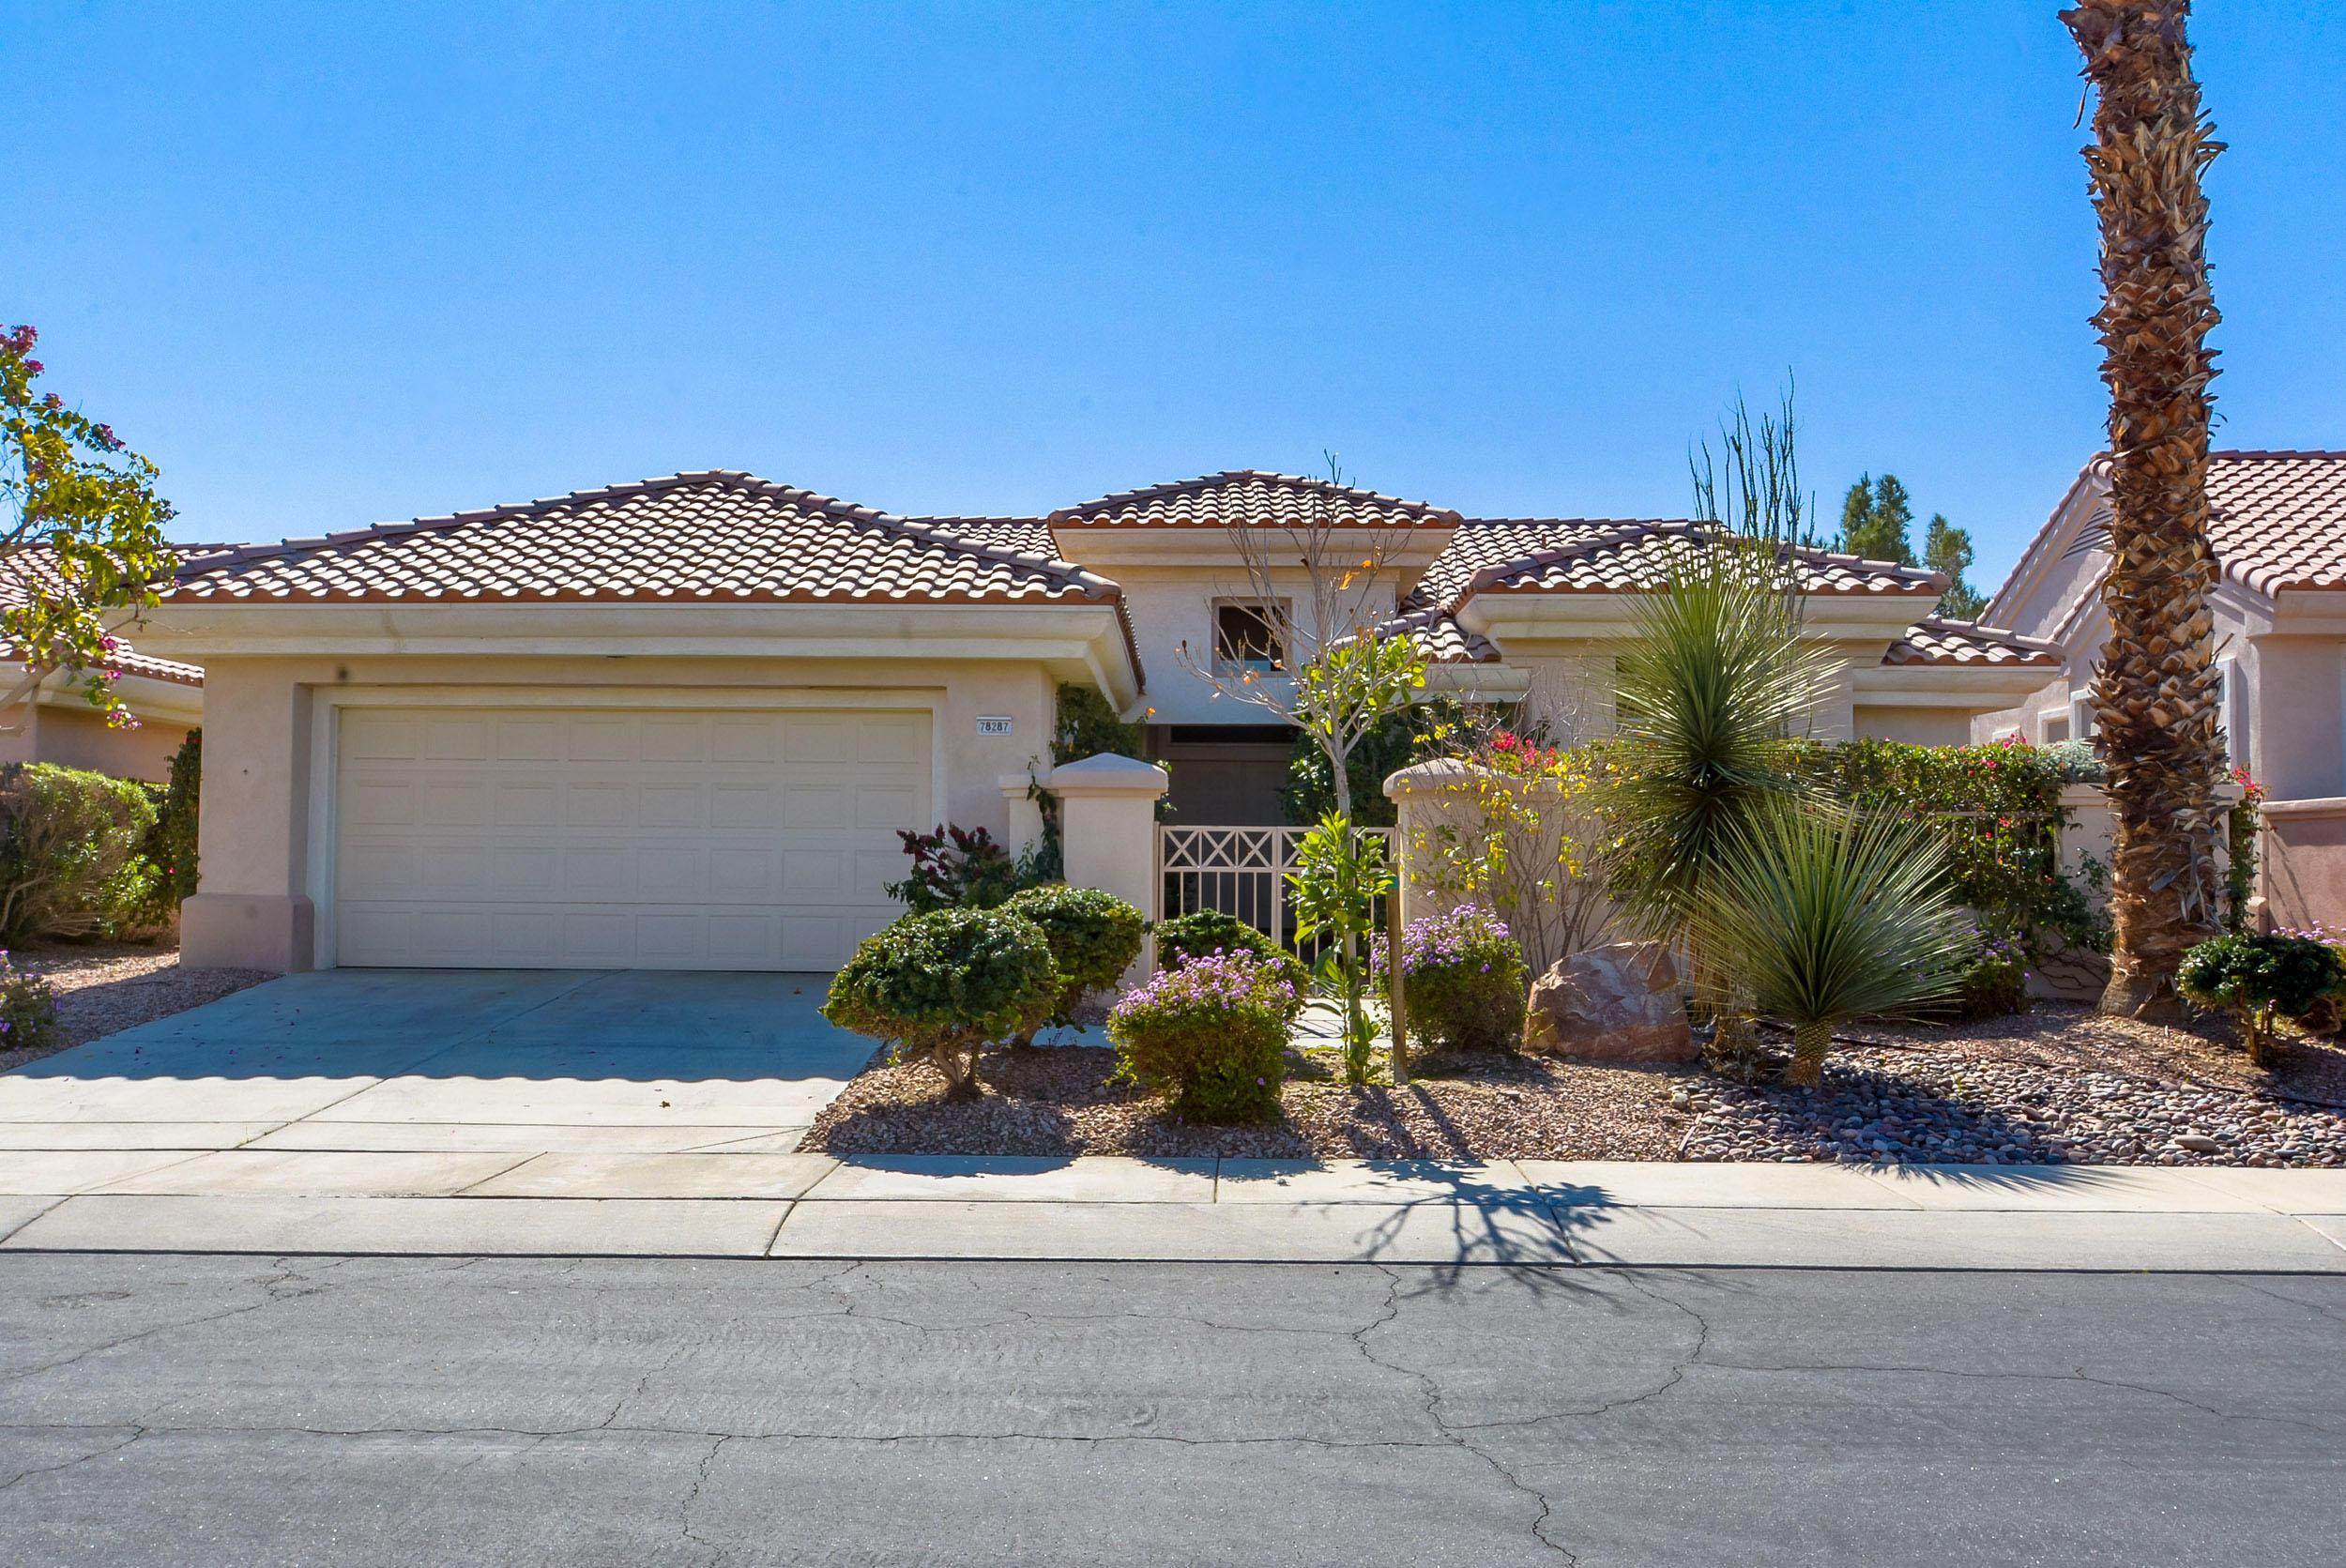 Photo of 78287 Willowrich Drive, Palm Desert, CA 92211